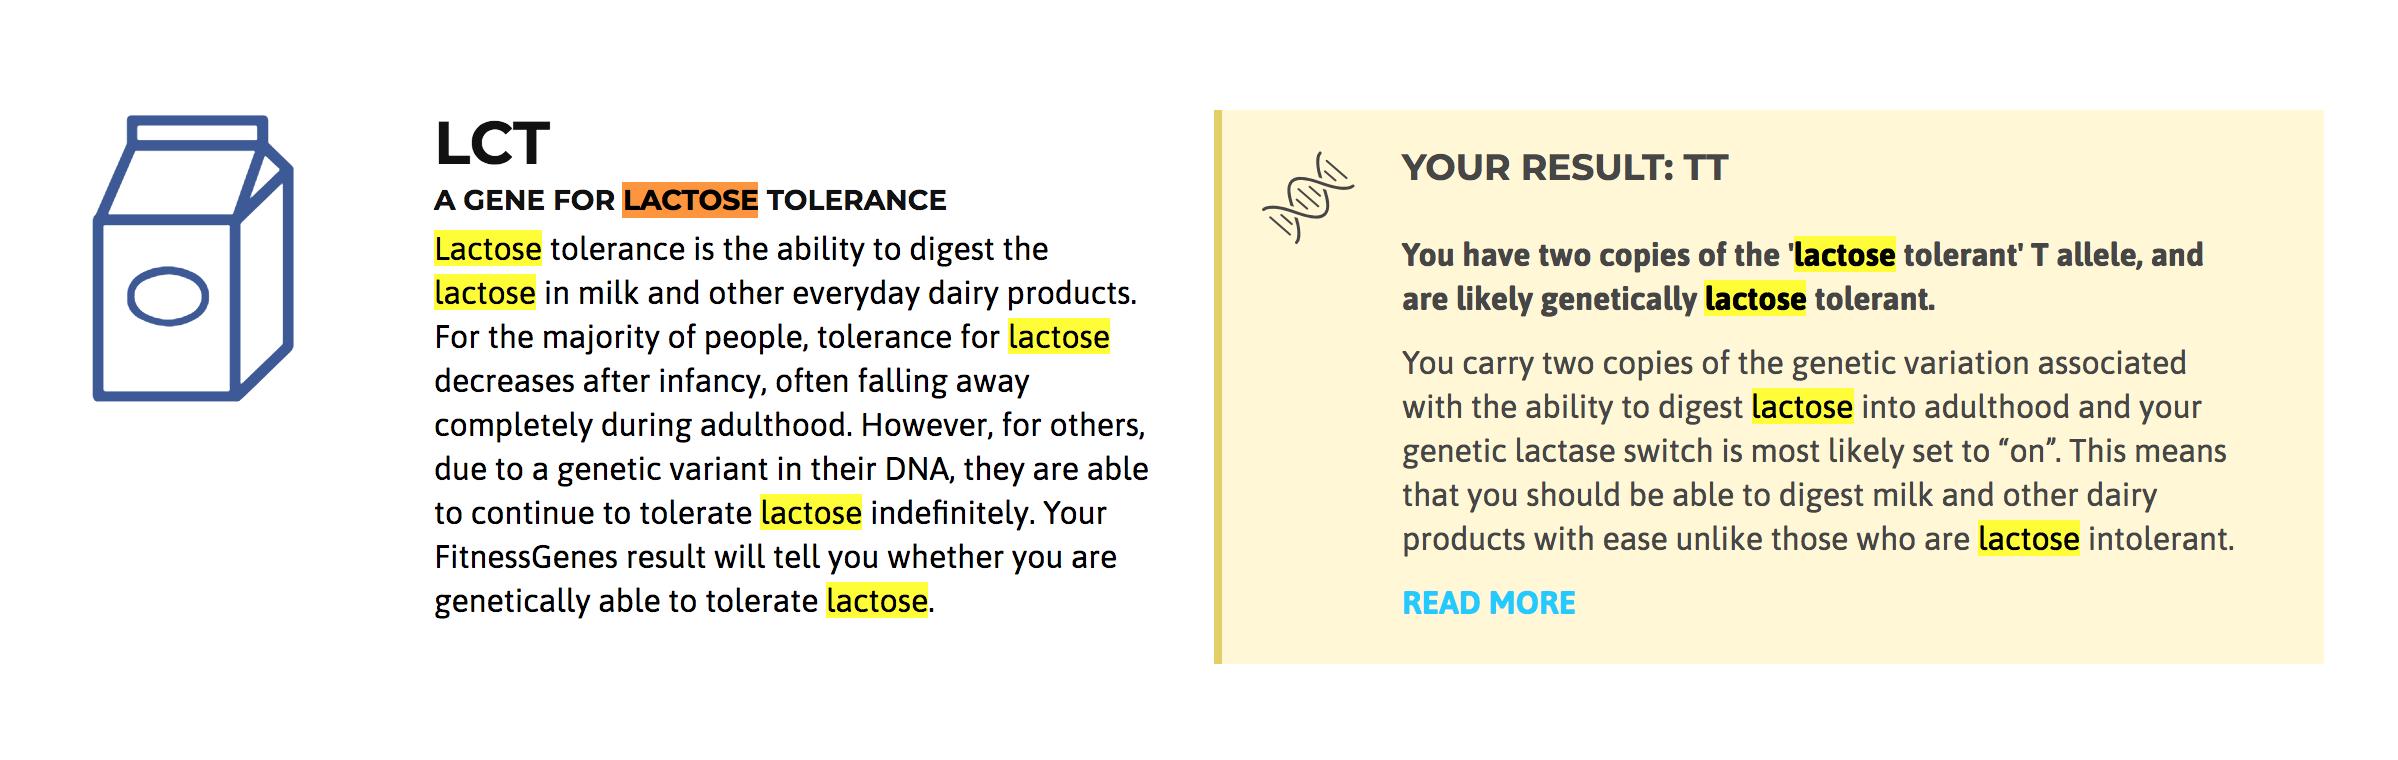 FitnessGenes-Lactose-Intolerance-test-genetics